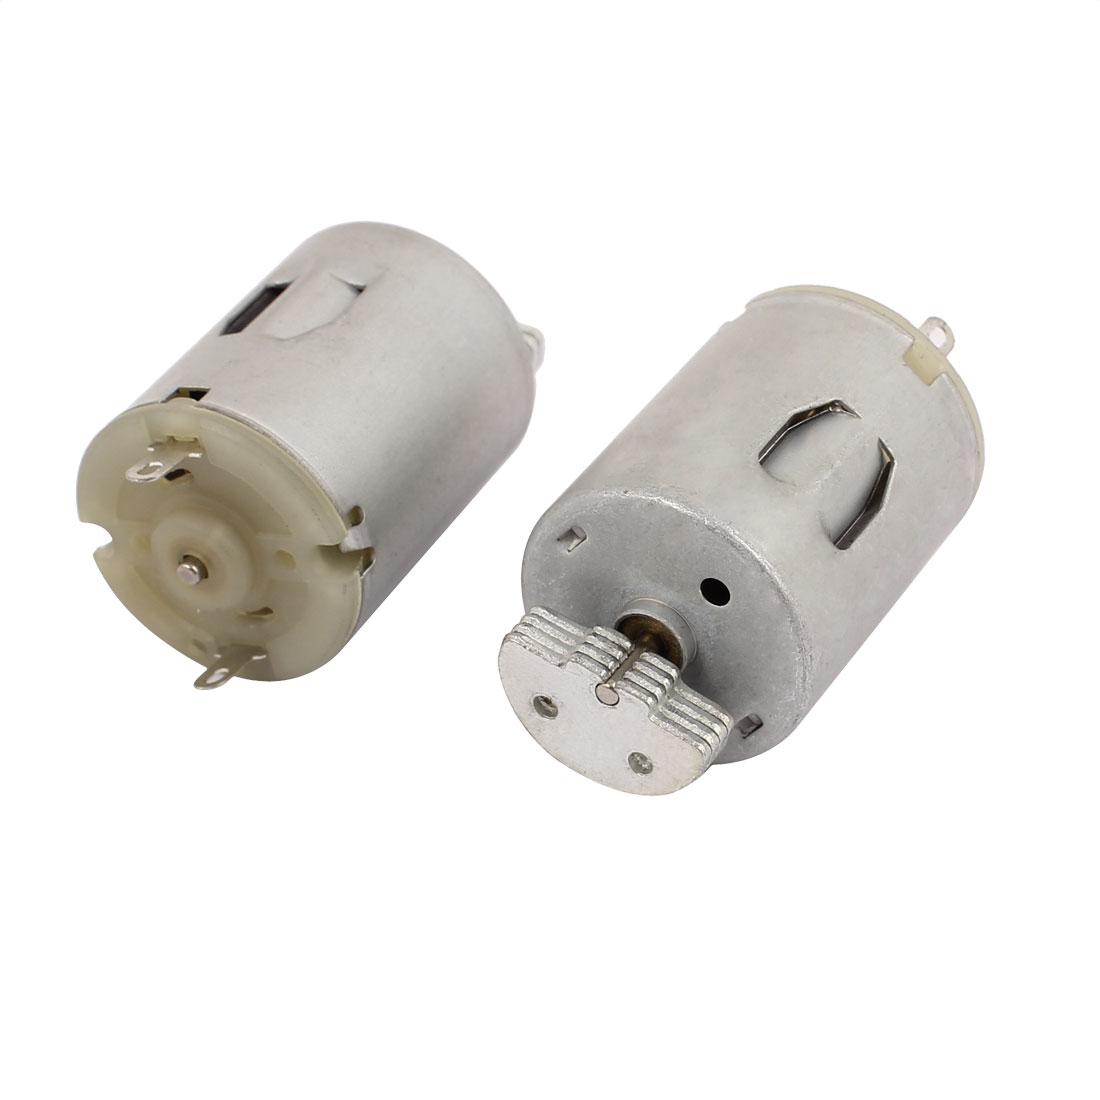 2Pcs DC 3-9V 13500RPM Large Torque Micro Vibration DC Motor for Electric Massage